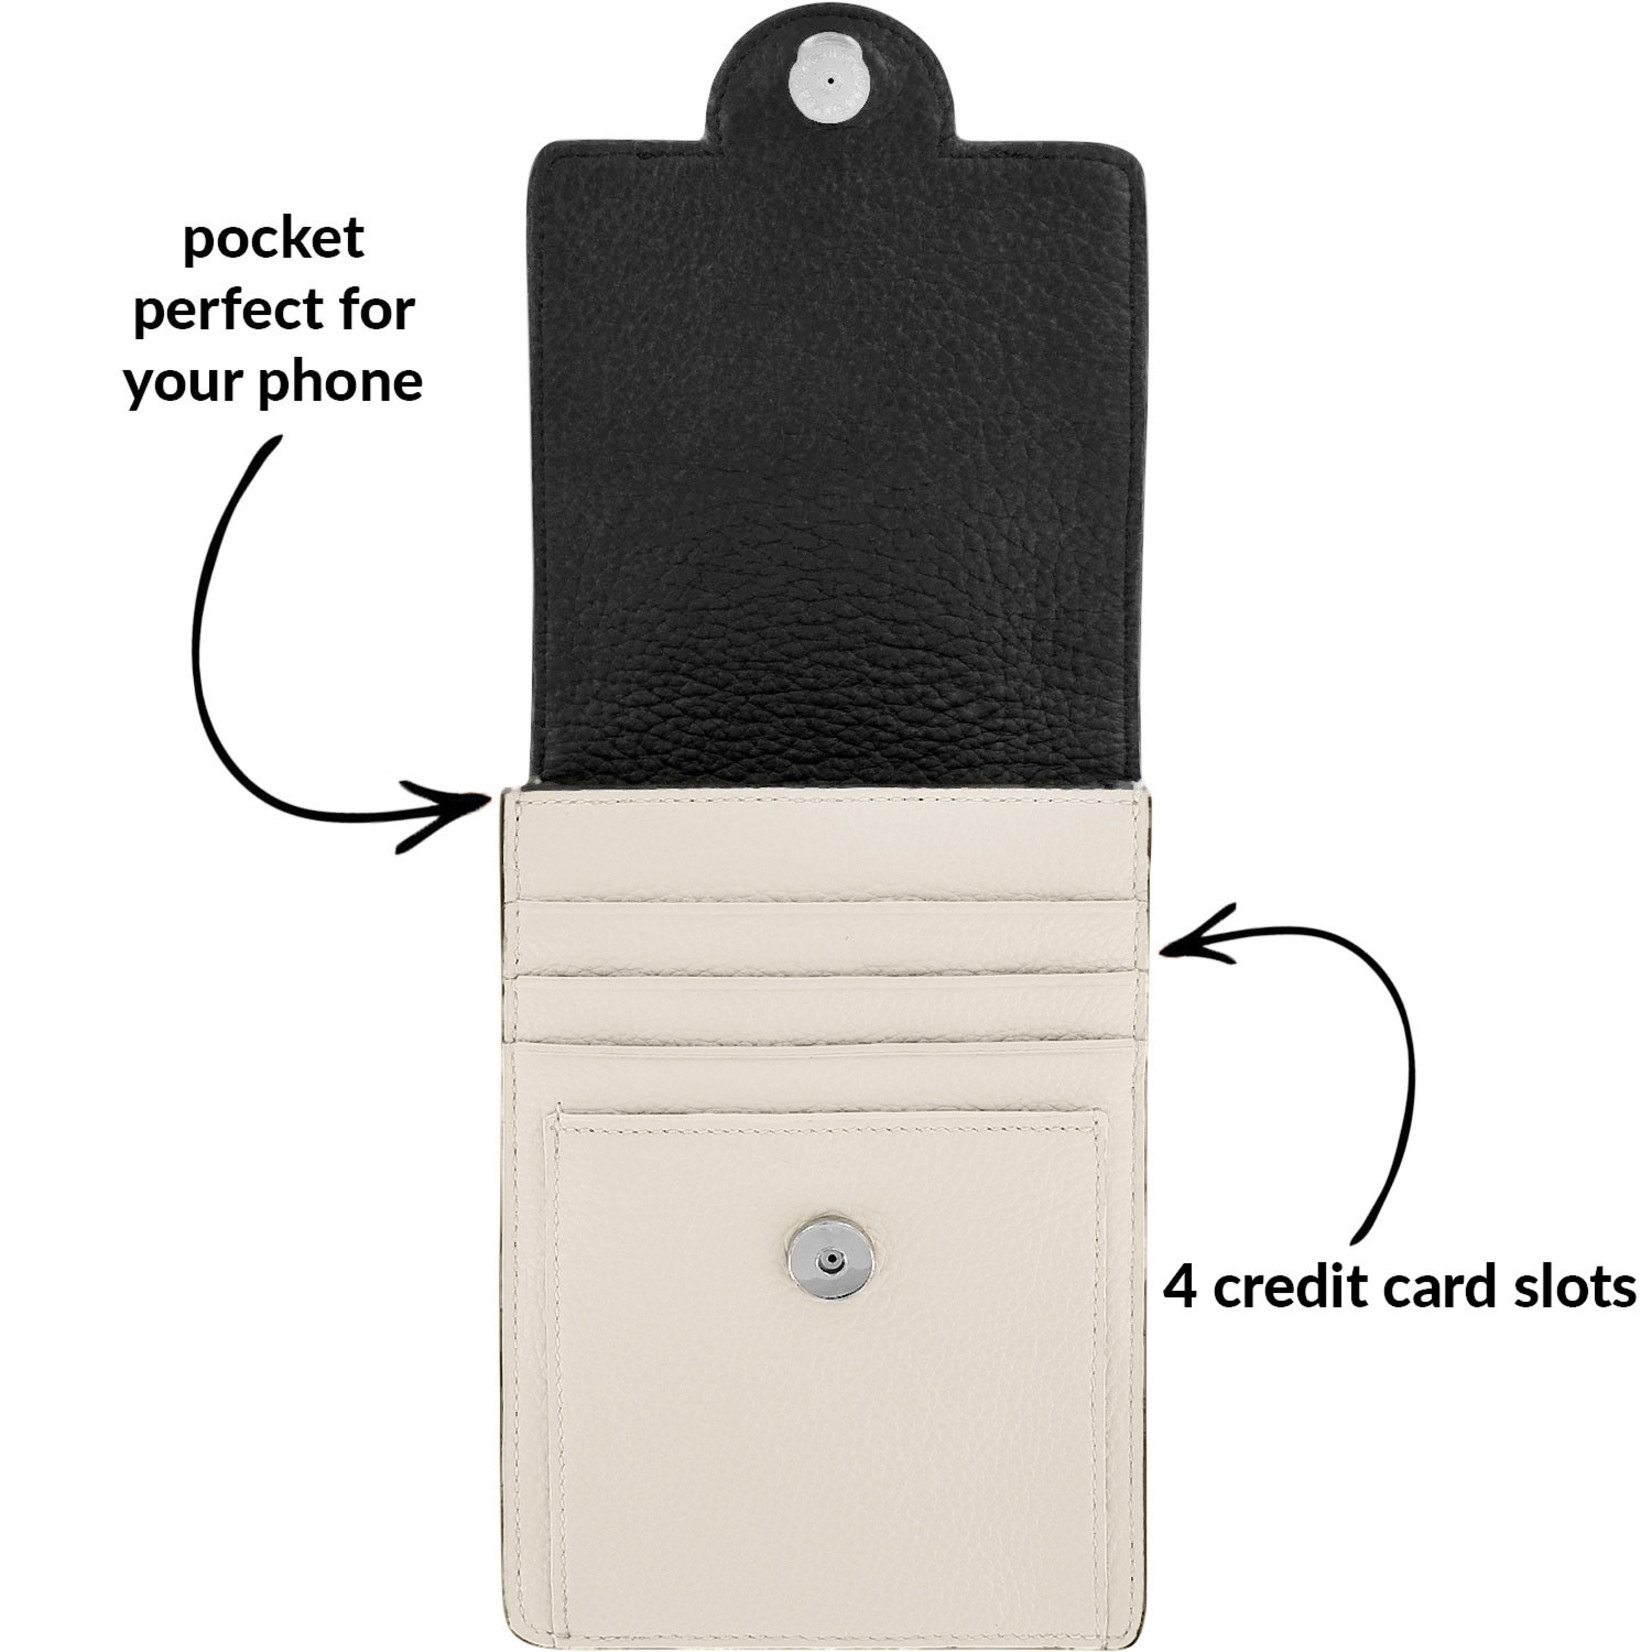 Brighton E5326B Ferrara Daytime Phone Organizer - Black/White